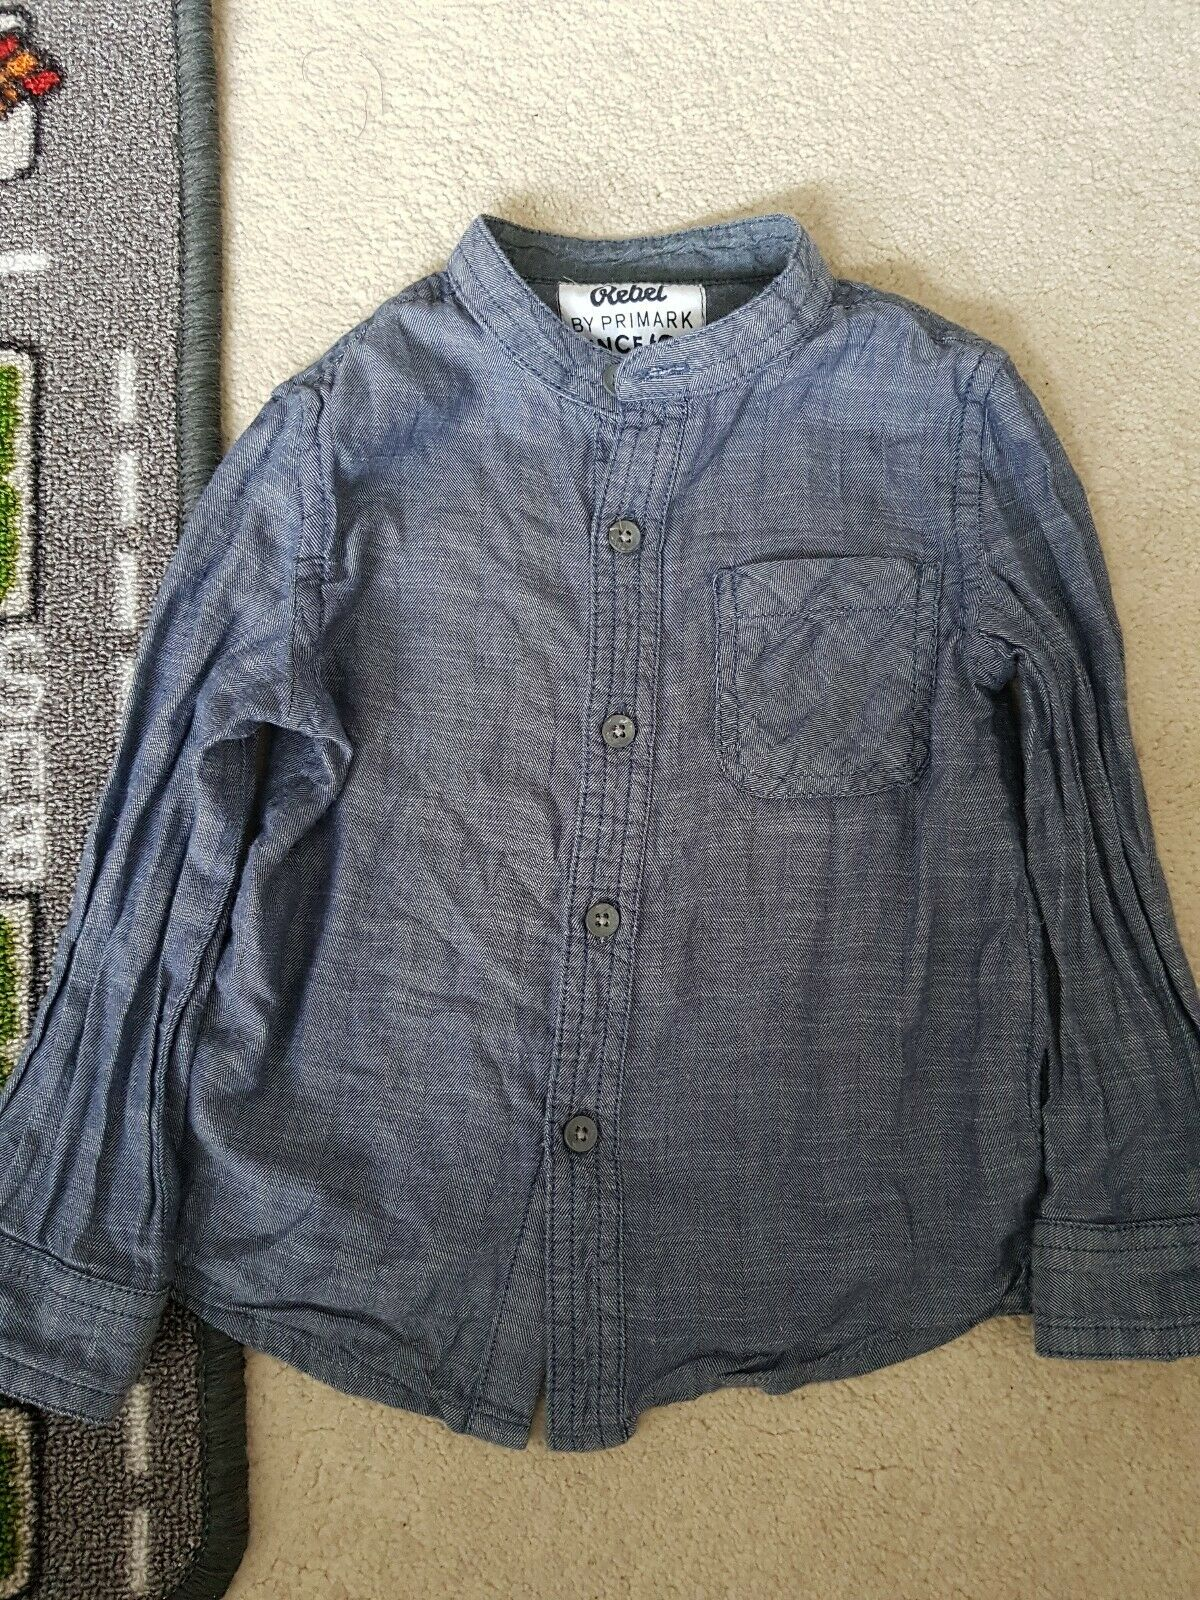 Blue Collarless Shirt Boys Size 2-3 Years Free P&P